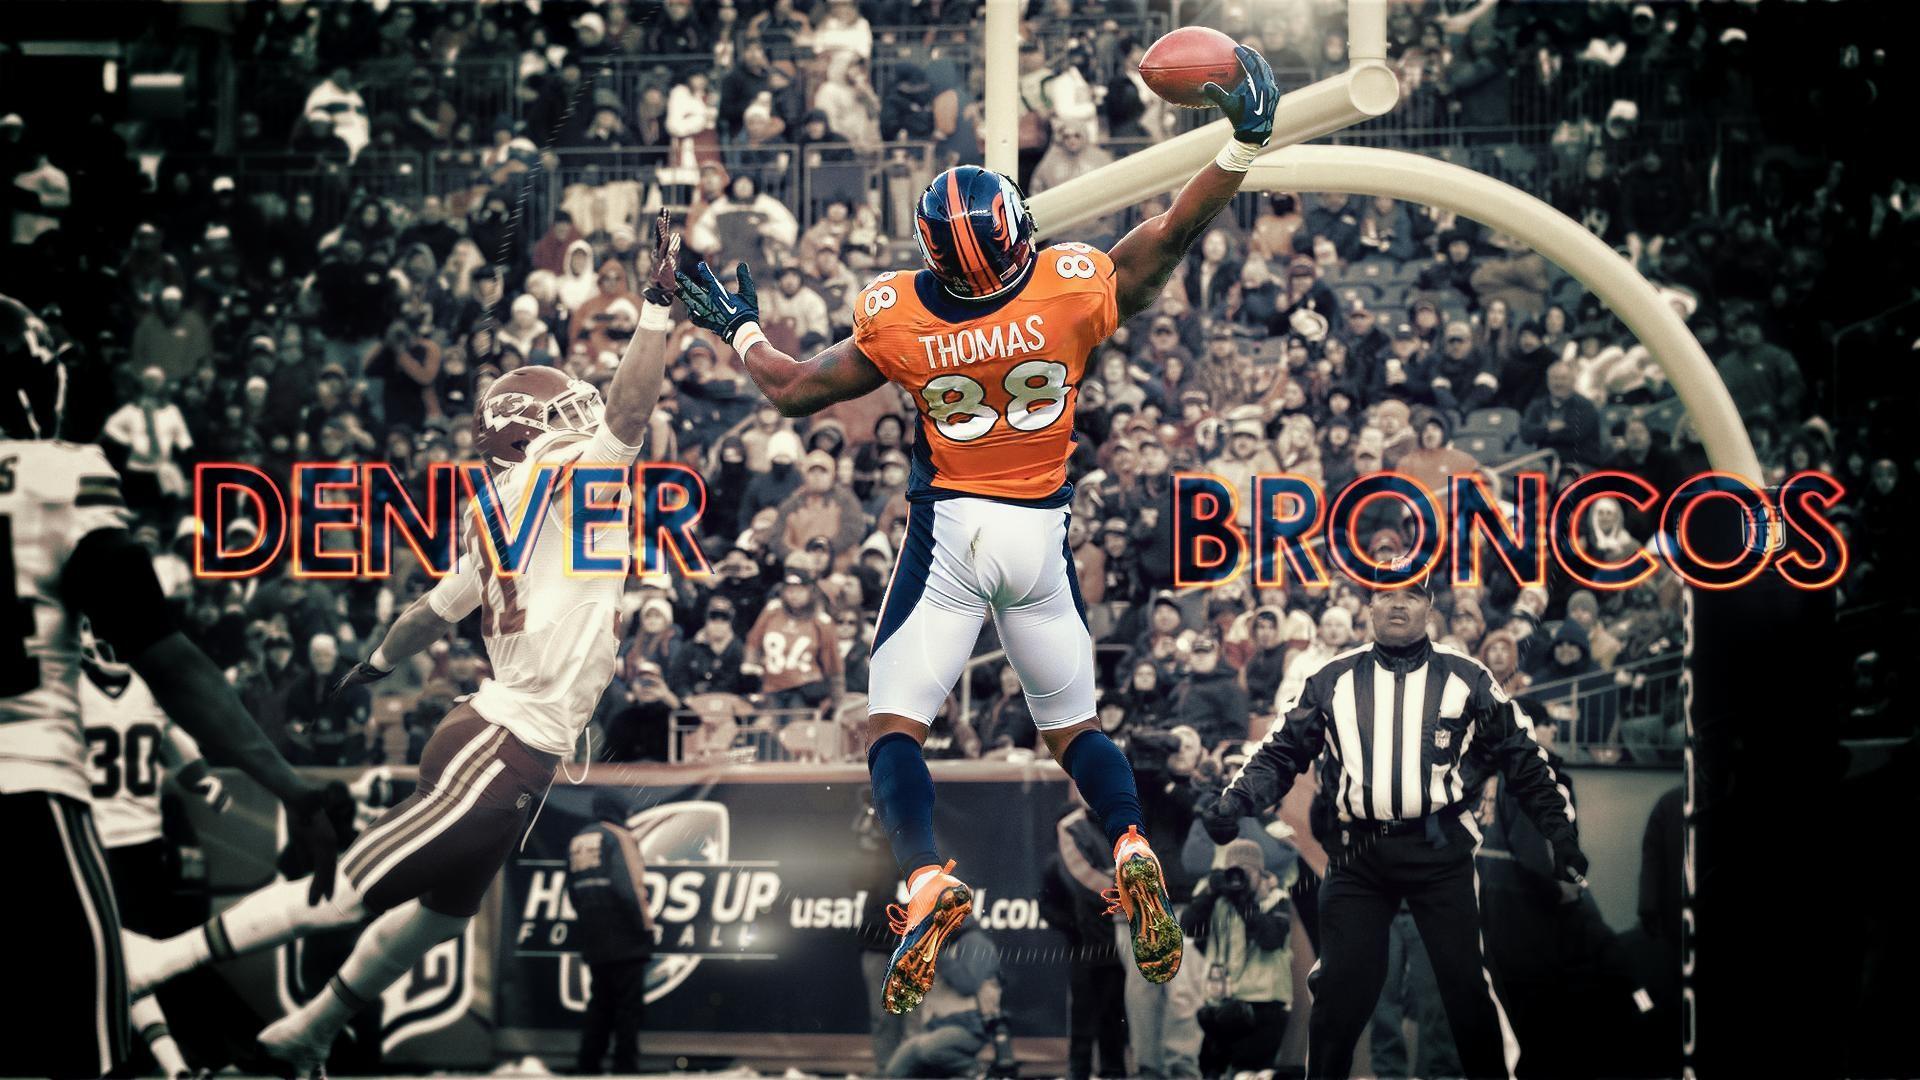 Res: 1920x1080, Demaryius-Thomas-Denver-Broncos -by-DenverSportsWalls-deviantart-com-on-deviantART-wallpaper-wpc5004328